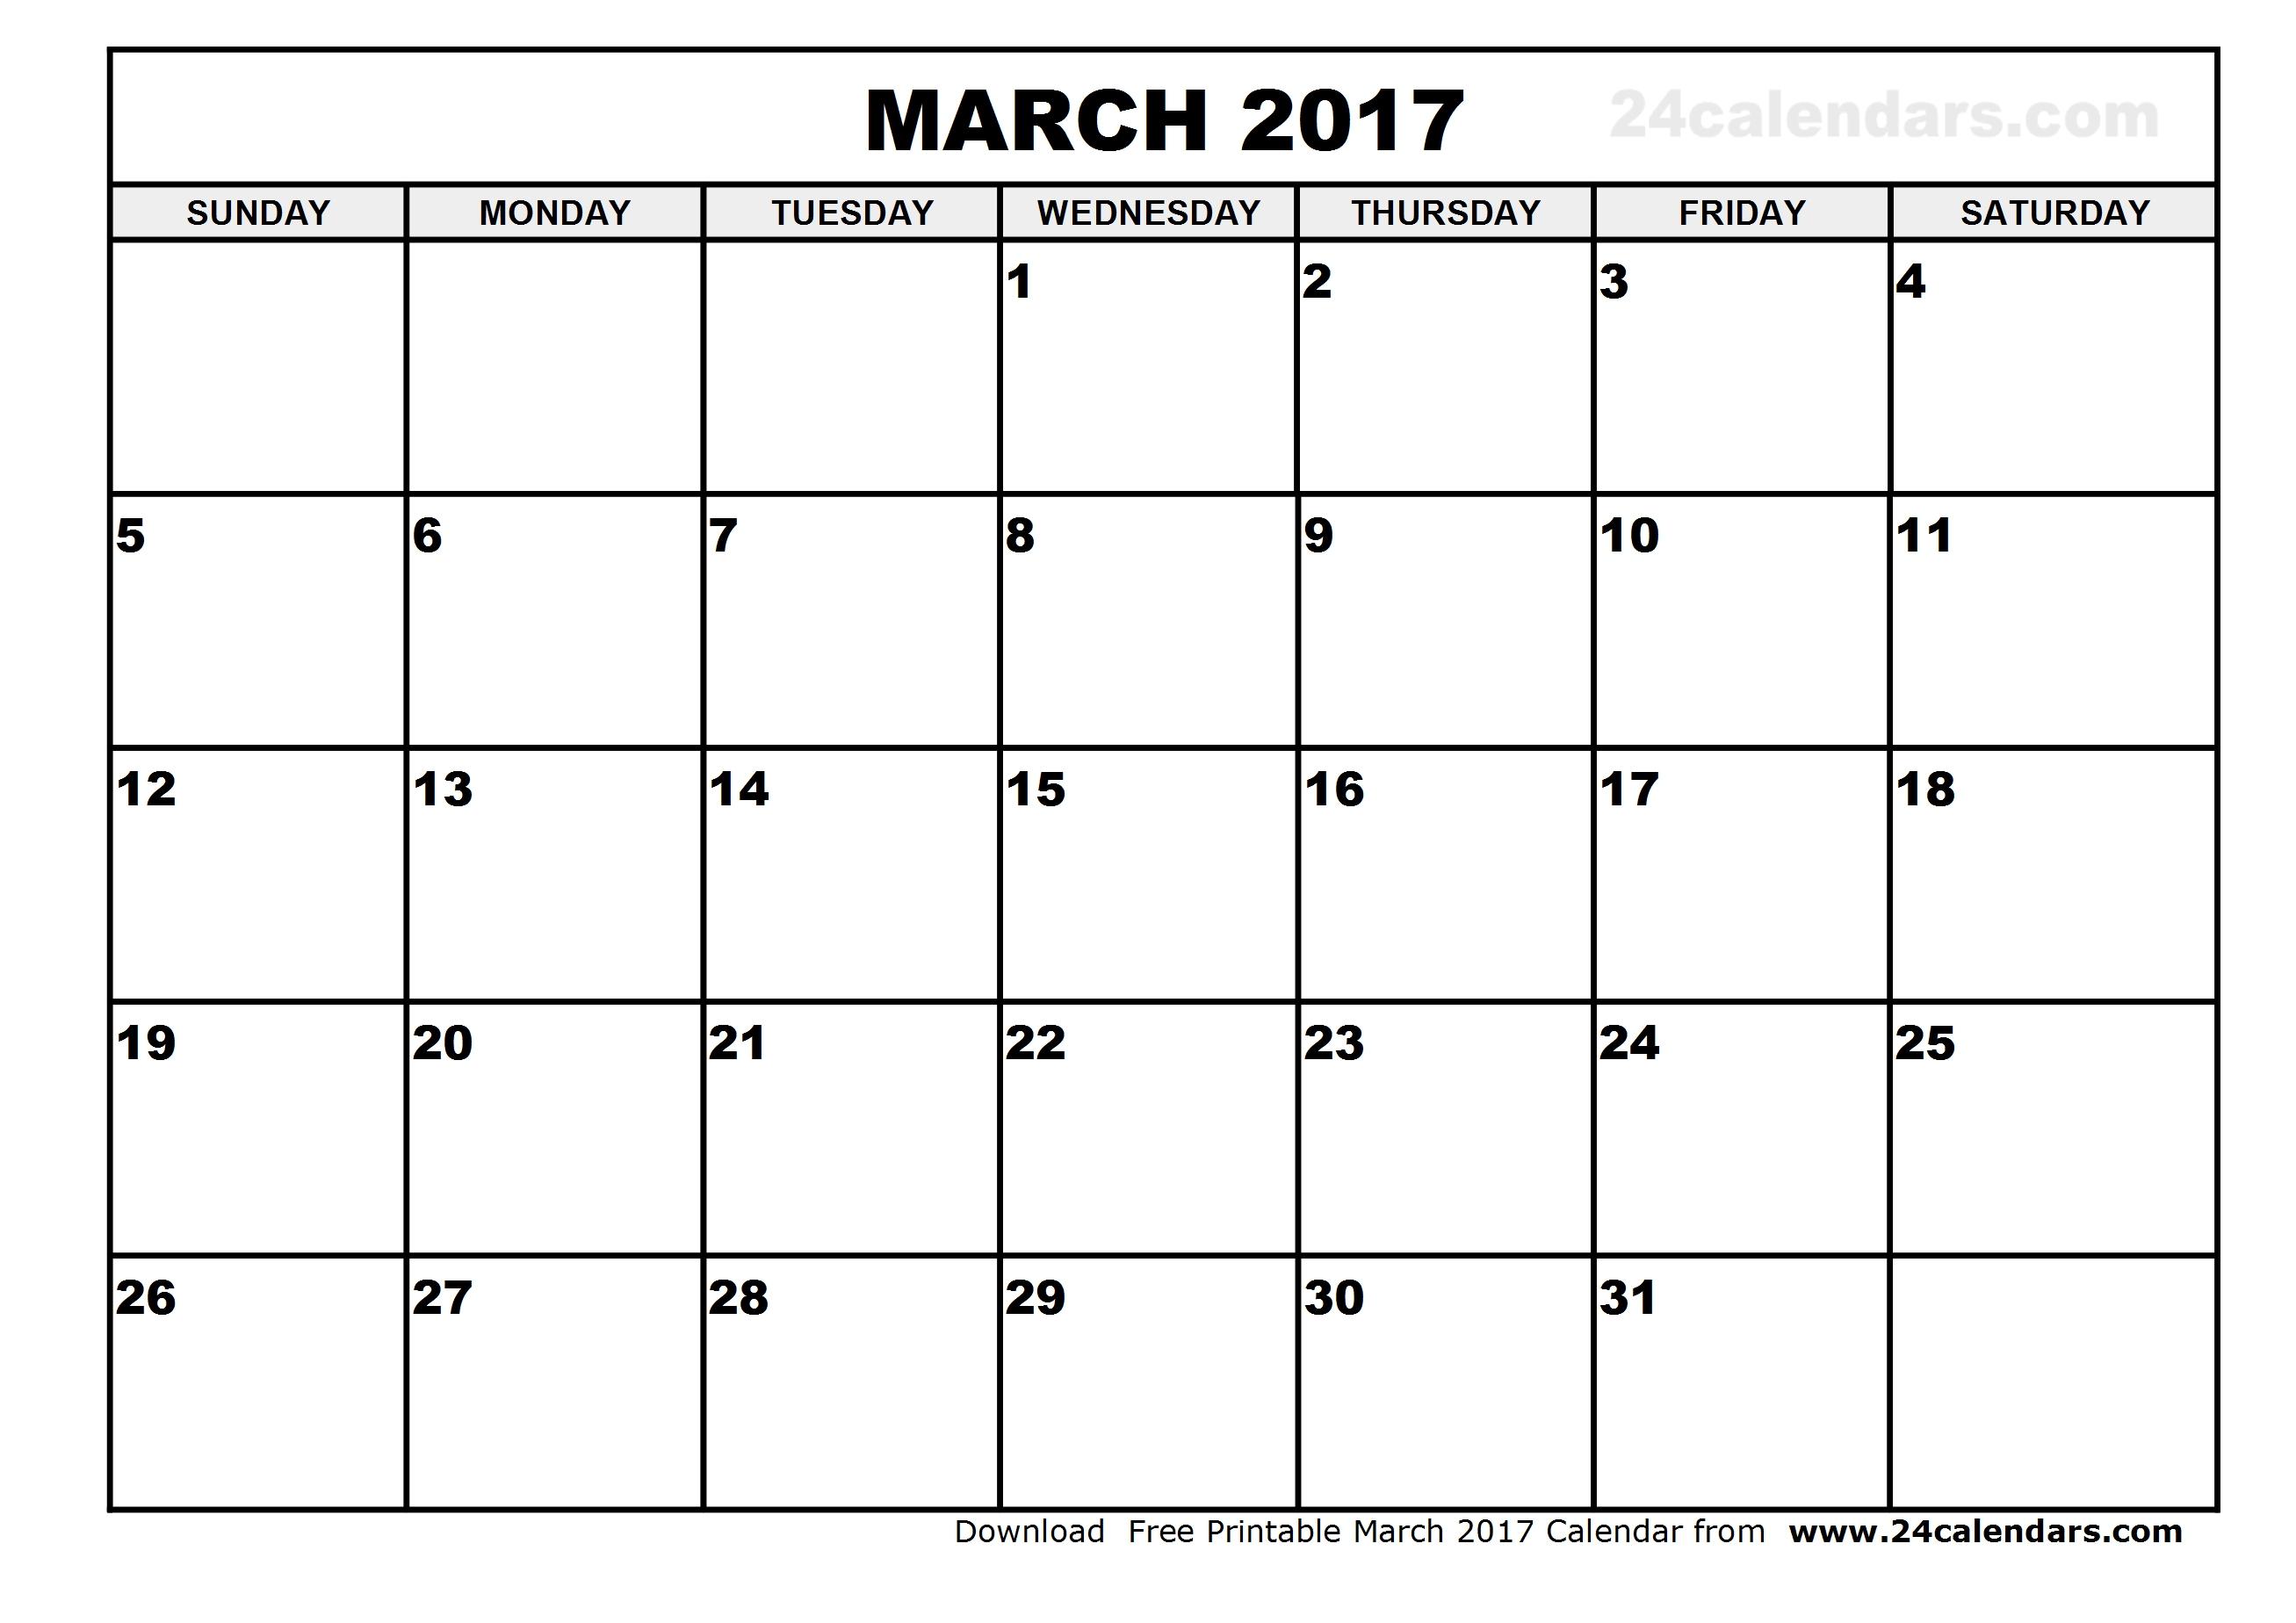 Free-Blank-Printable-March-2017-Calendar-Printable pertaining to August Blank Calendar Printable